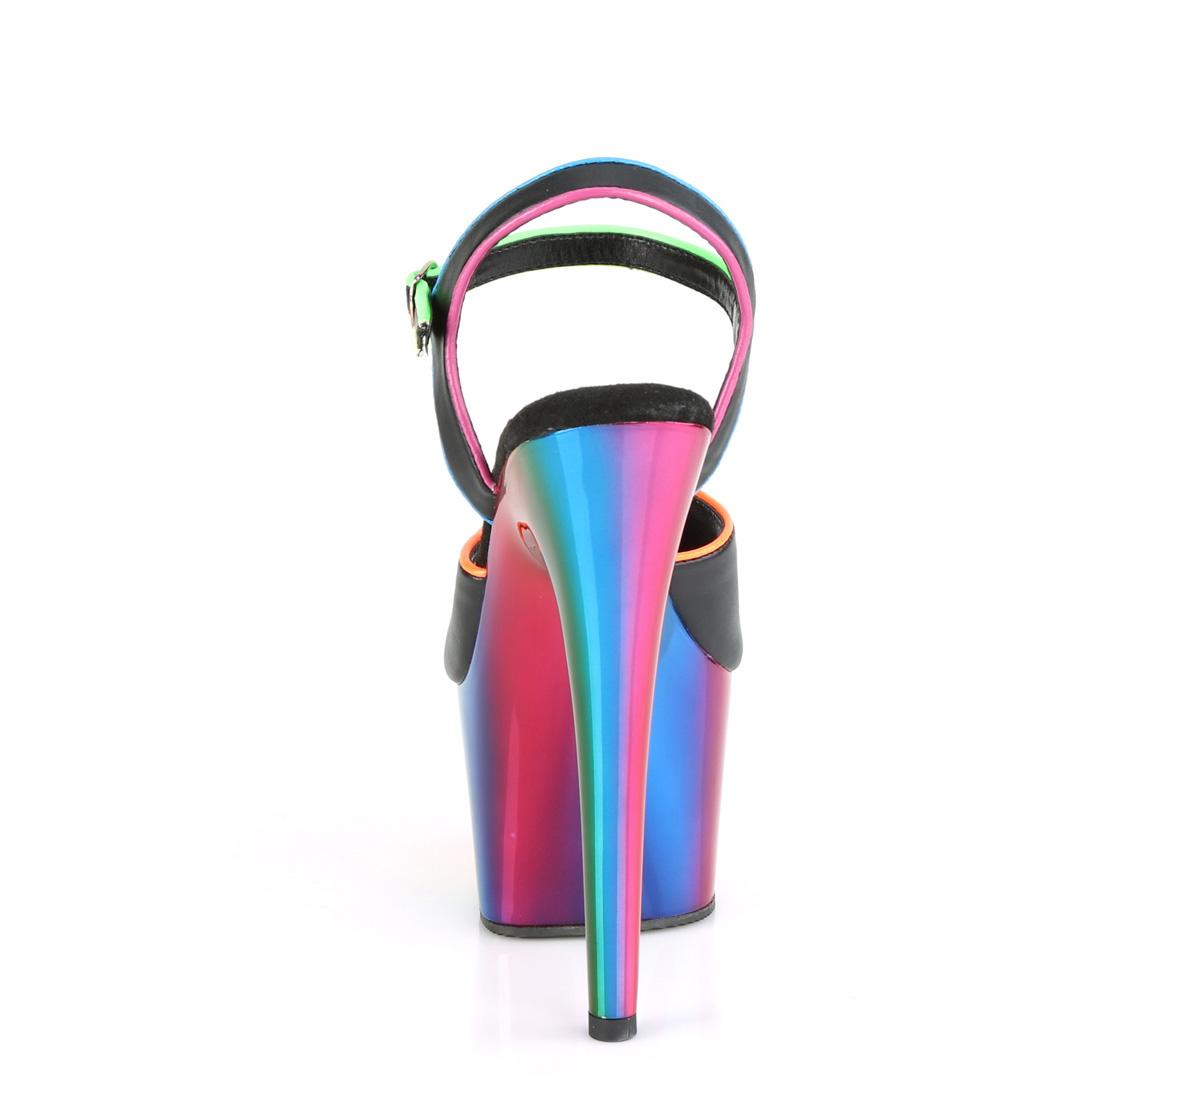 Pleaser(プリーザー) ADORE-709RC-02 レインボークロームプラットフォームサンダル 厚底 虹色◆取り寄せ